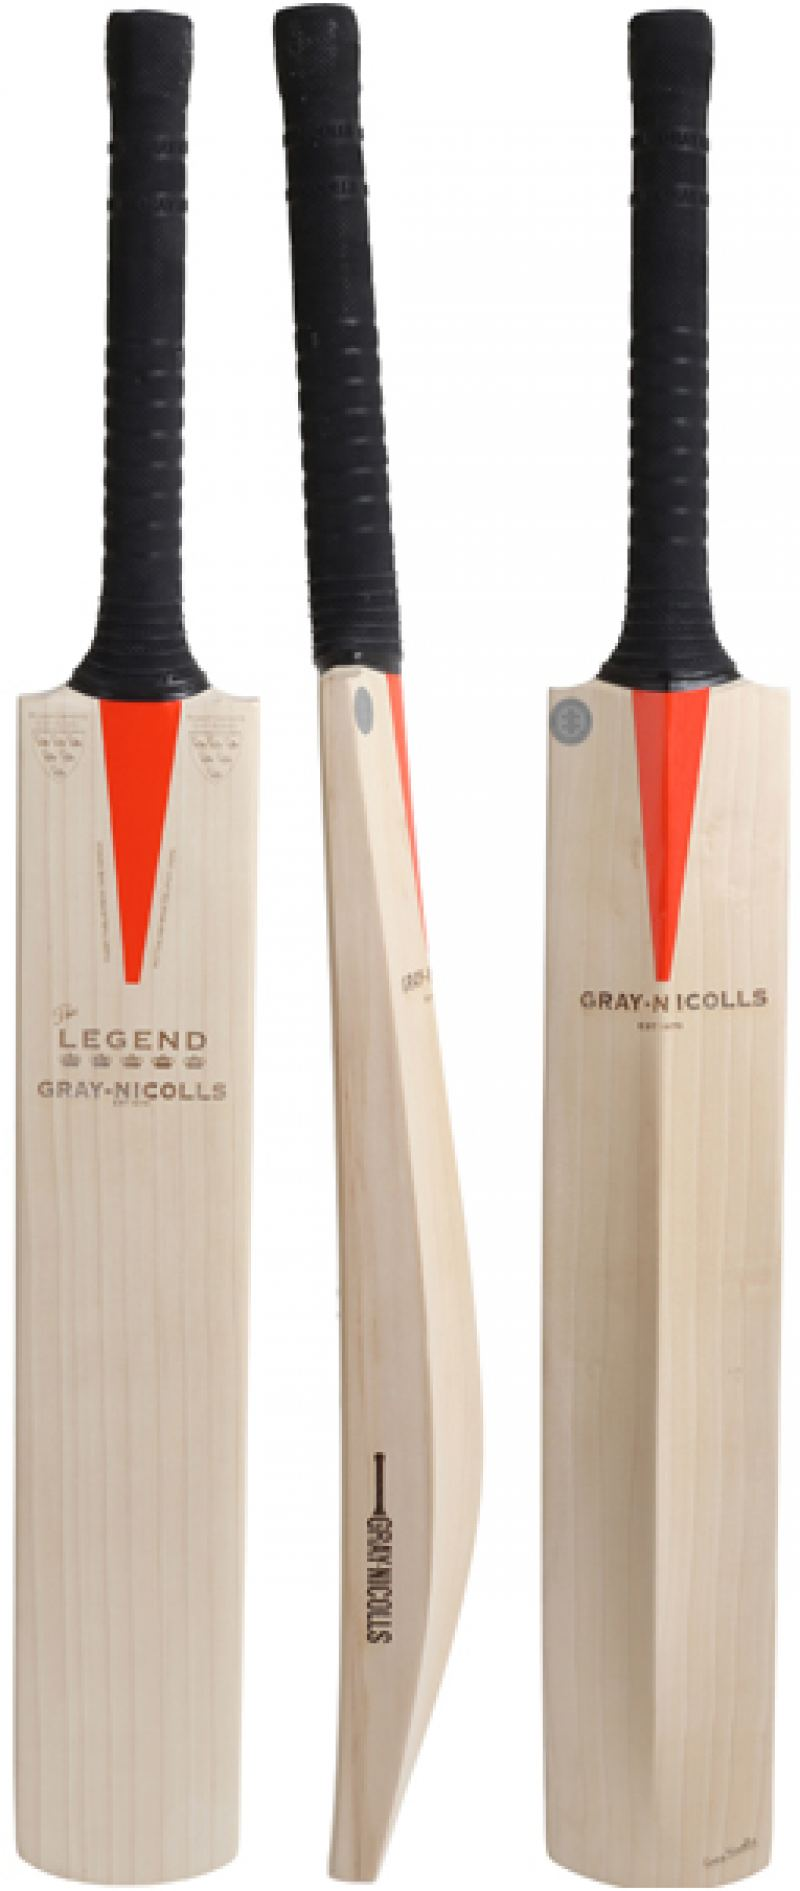 Gray Nicolls Legend Cricket Bat